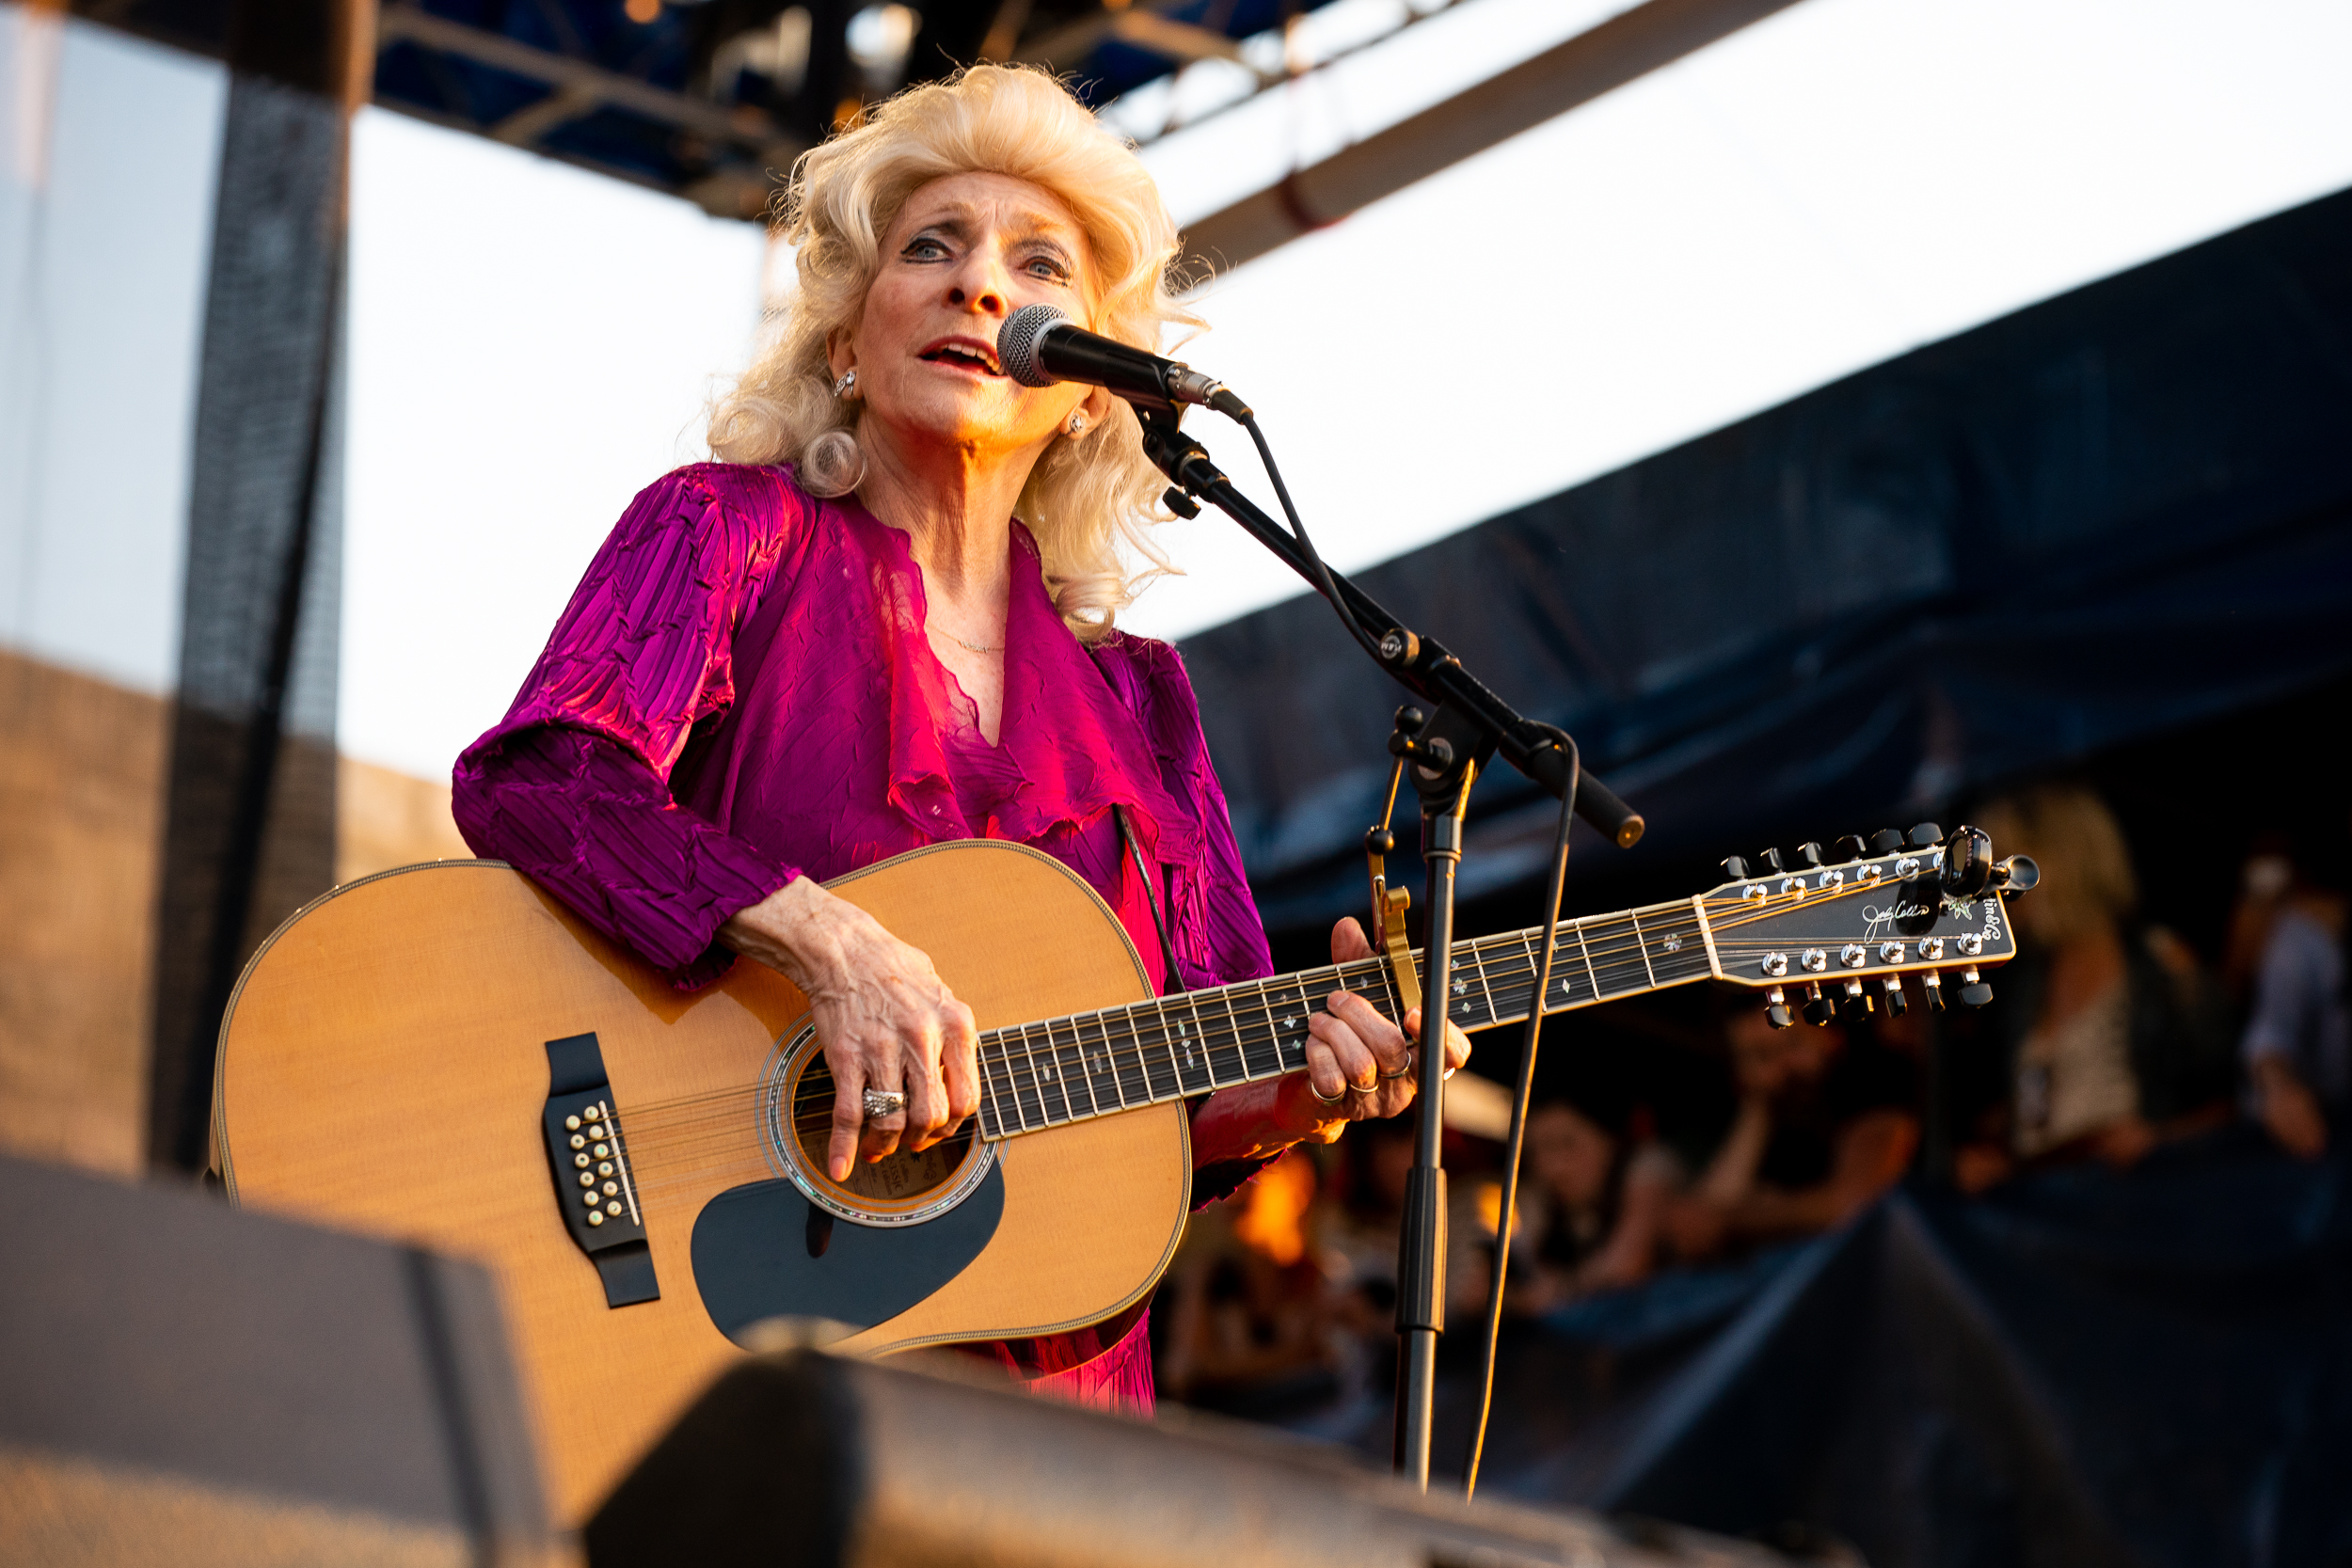 Judy Collins at Newport Folk Festival (Photo by Mauricio Castro)